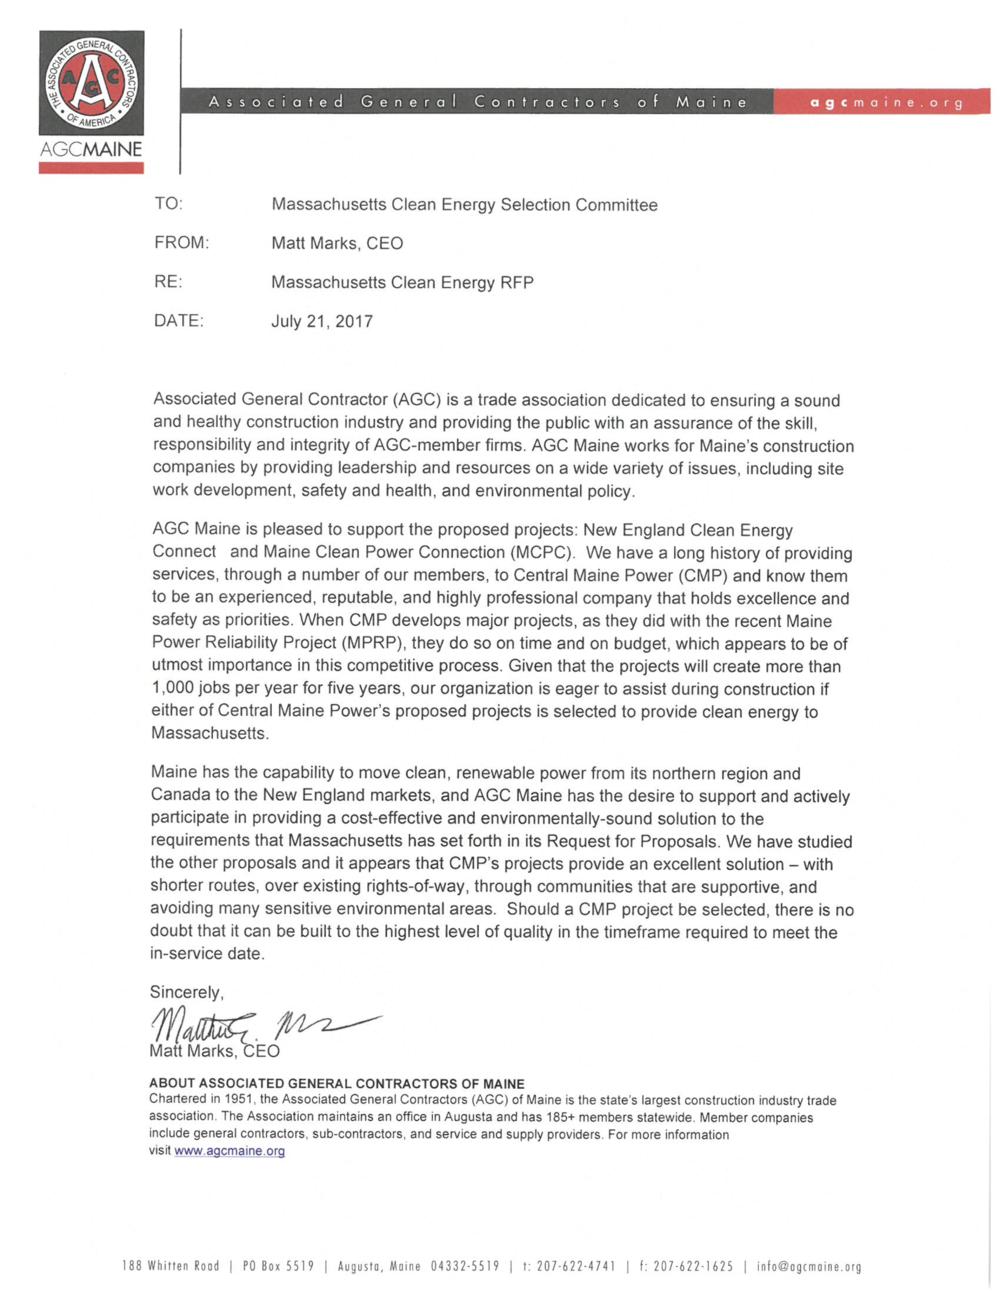 AGC Letter #2.png